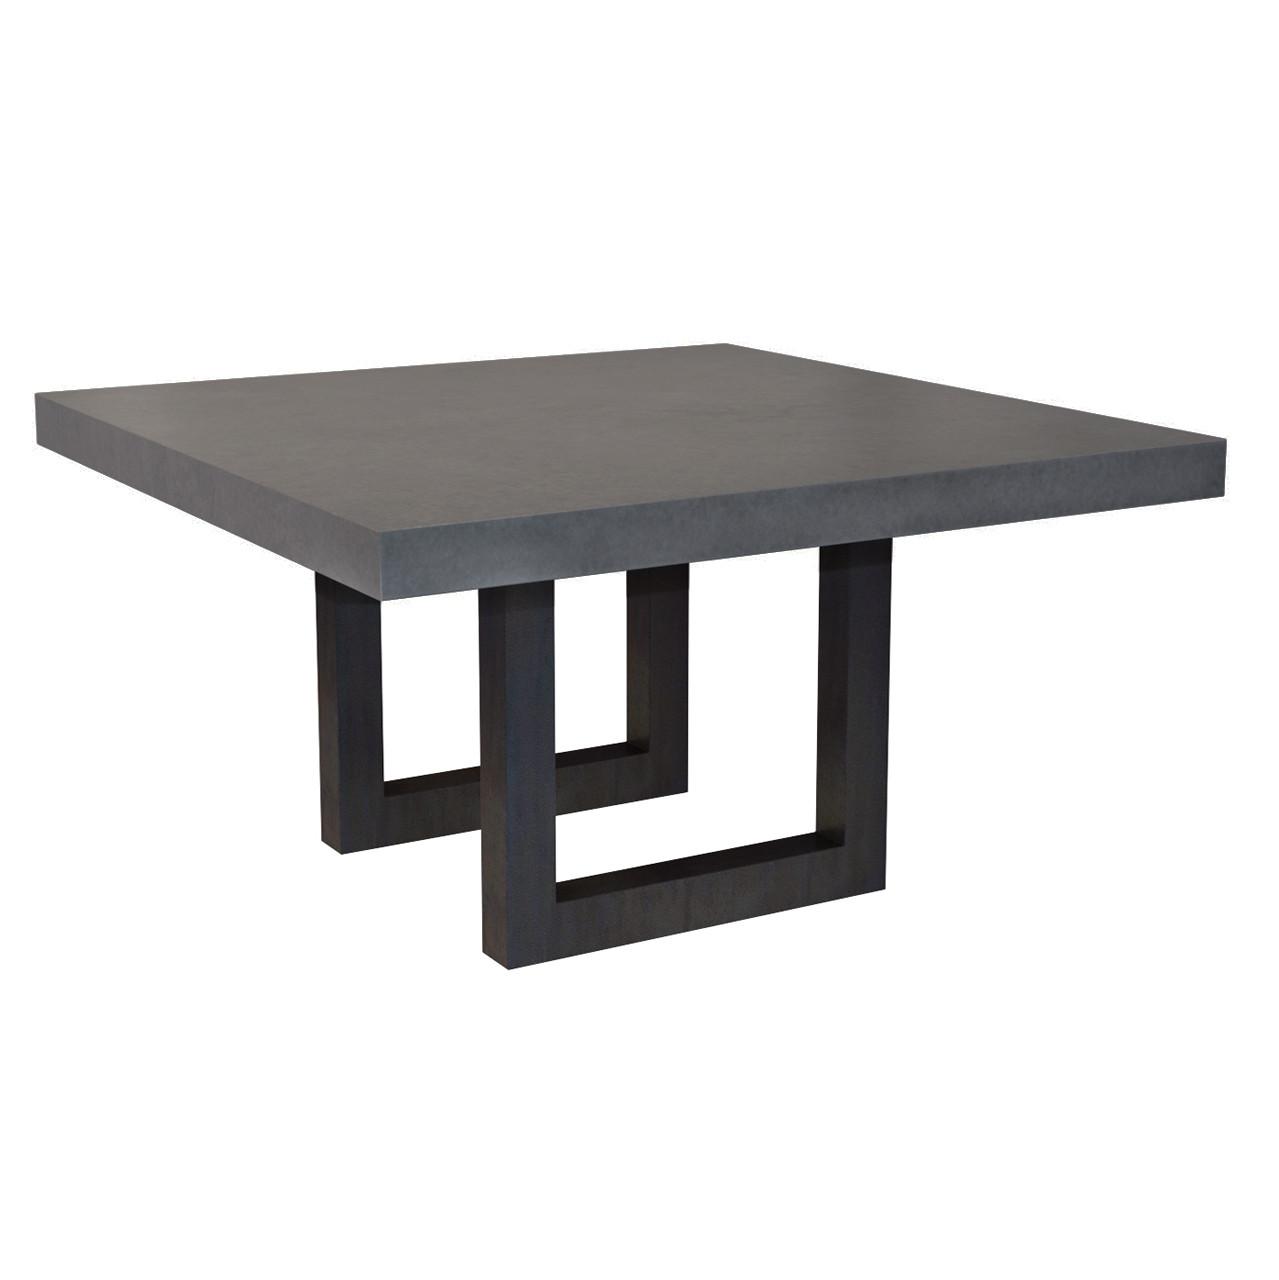 Square Zen Concrete Dining Table Trueform